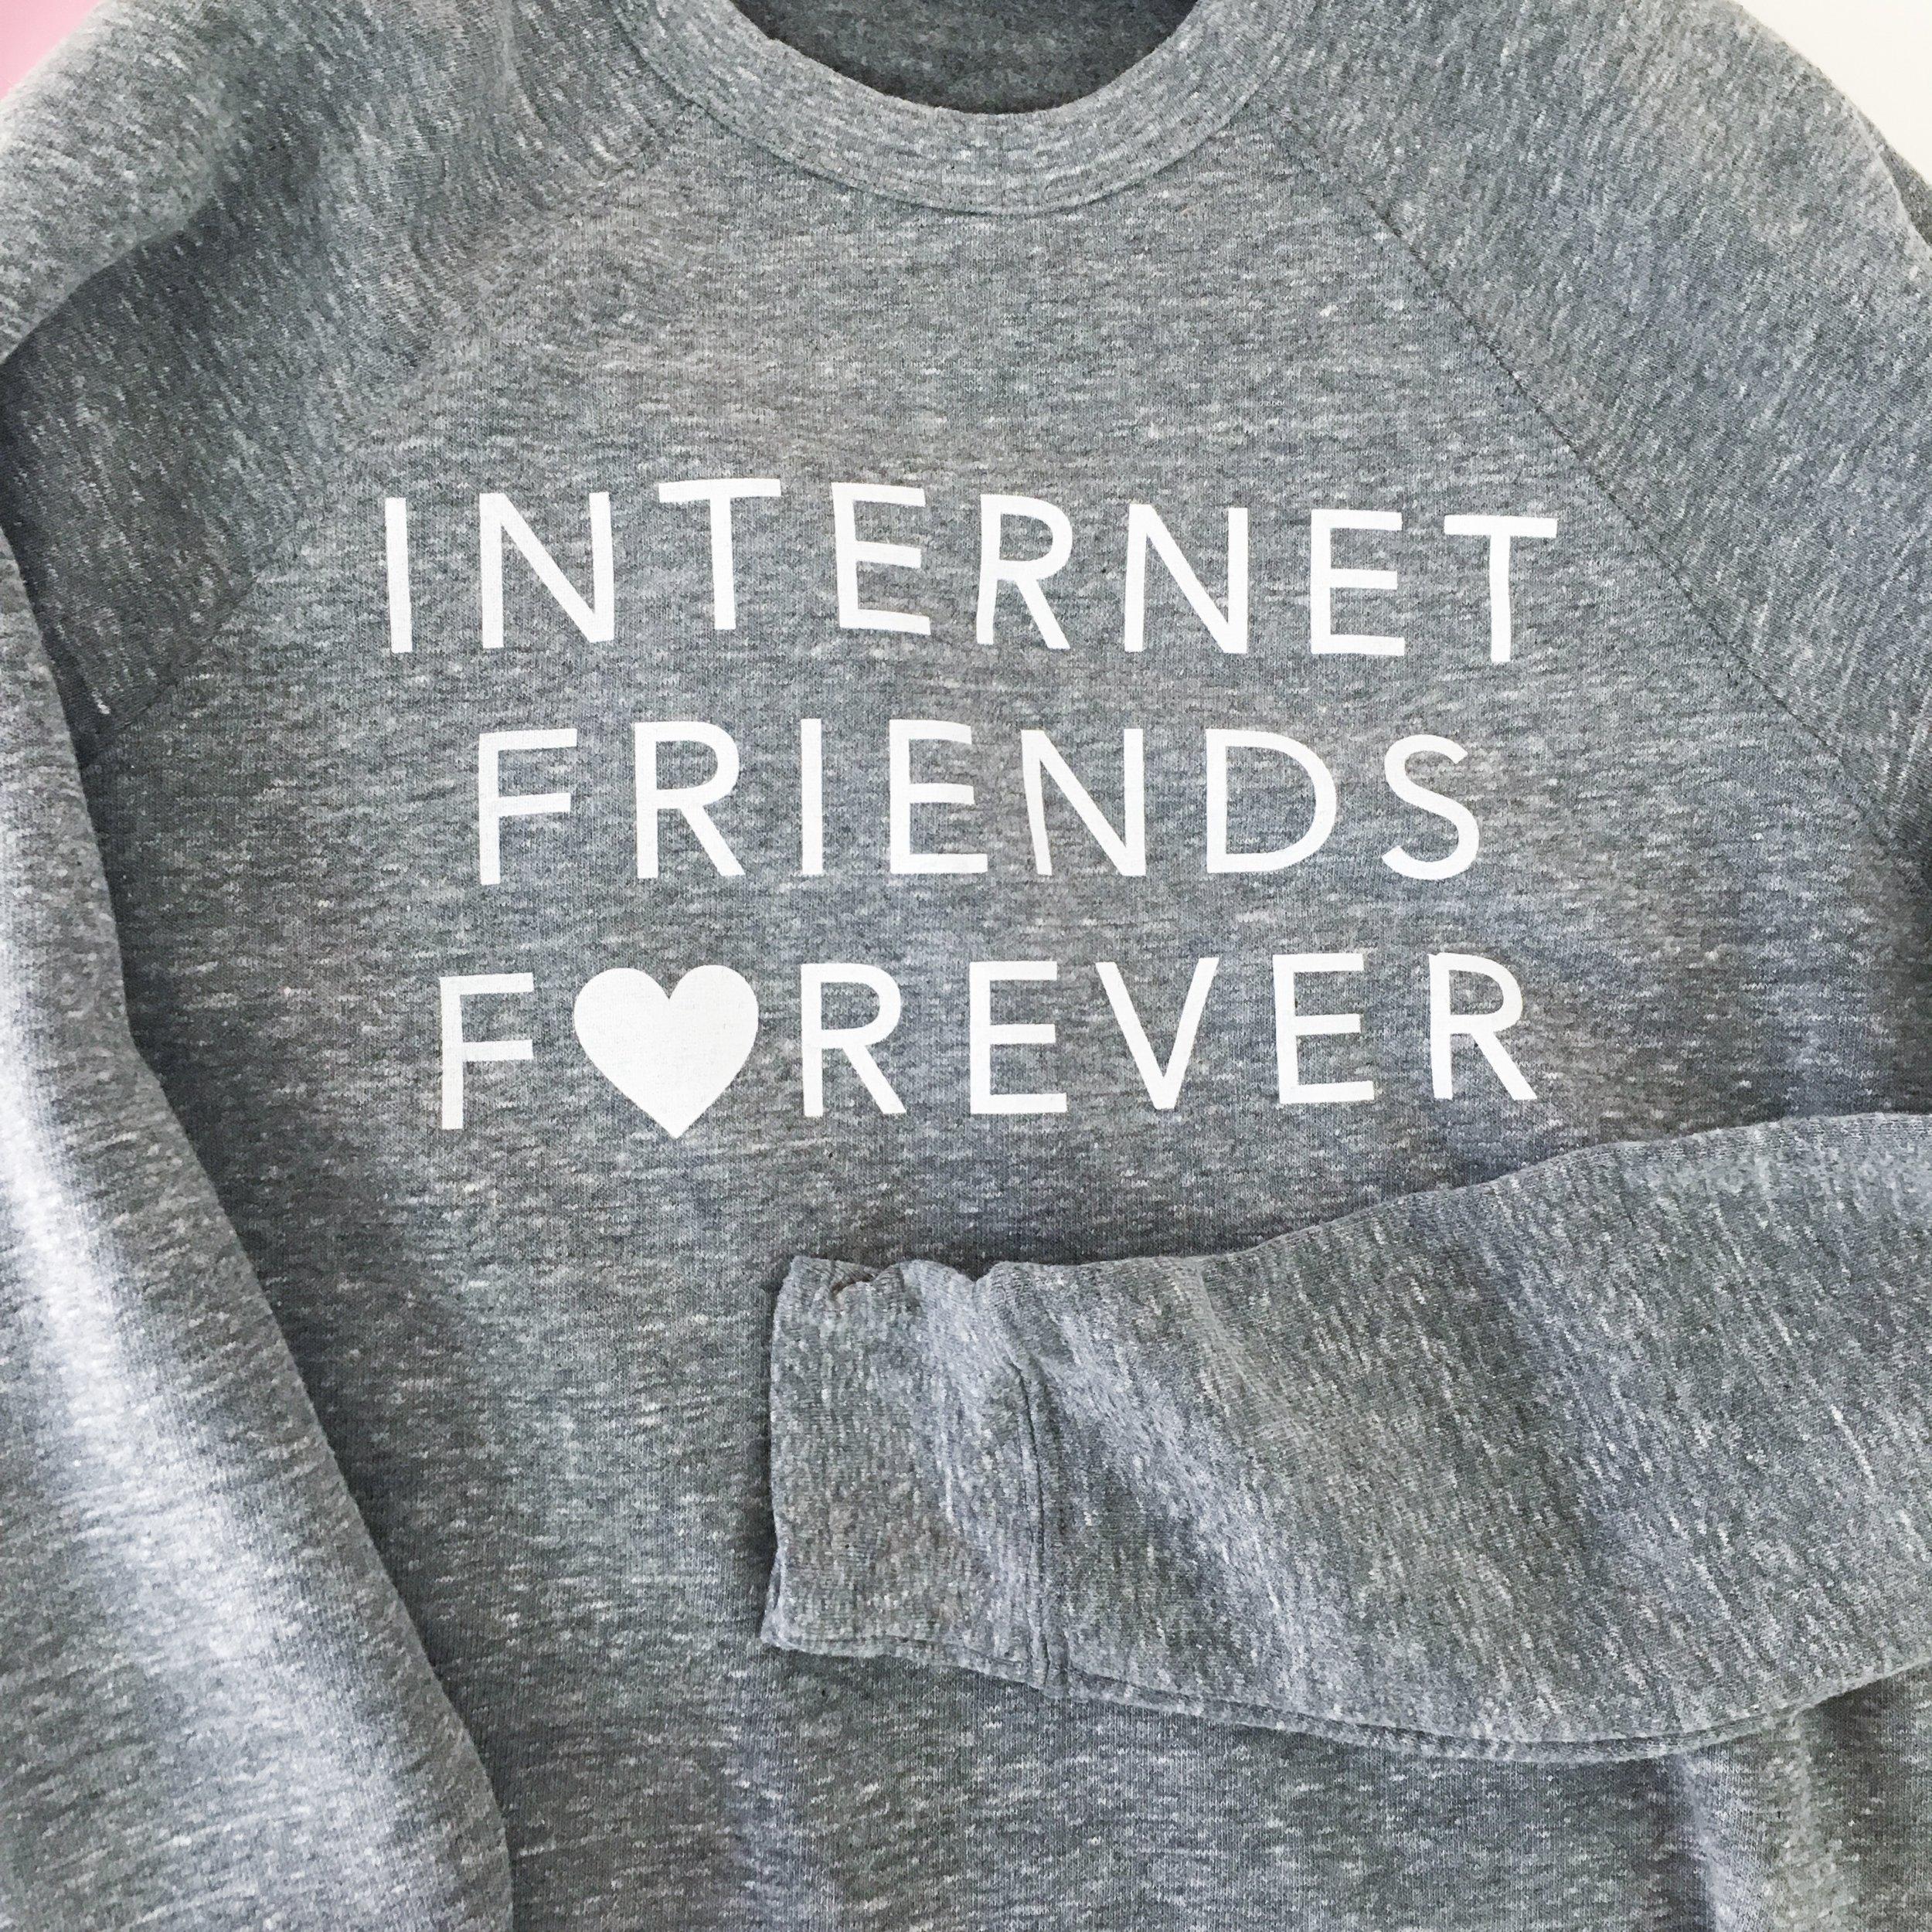 internet-friends-forever-crw